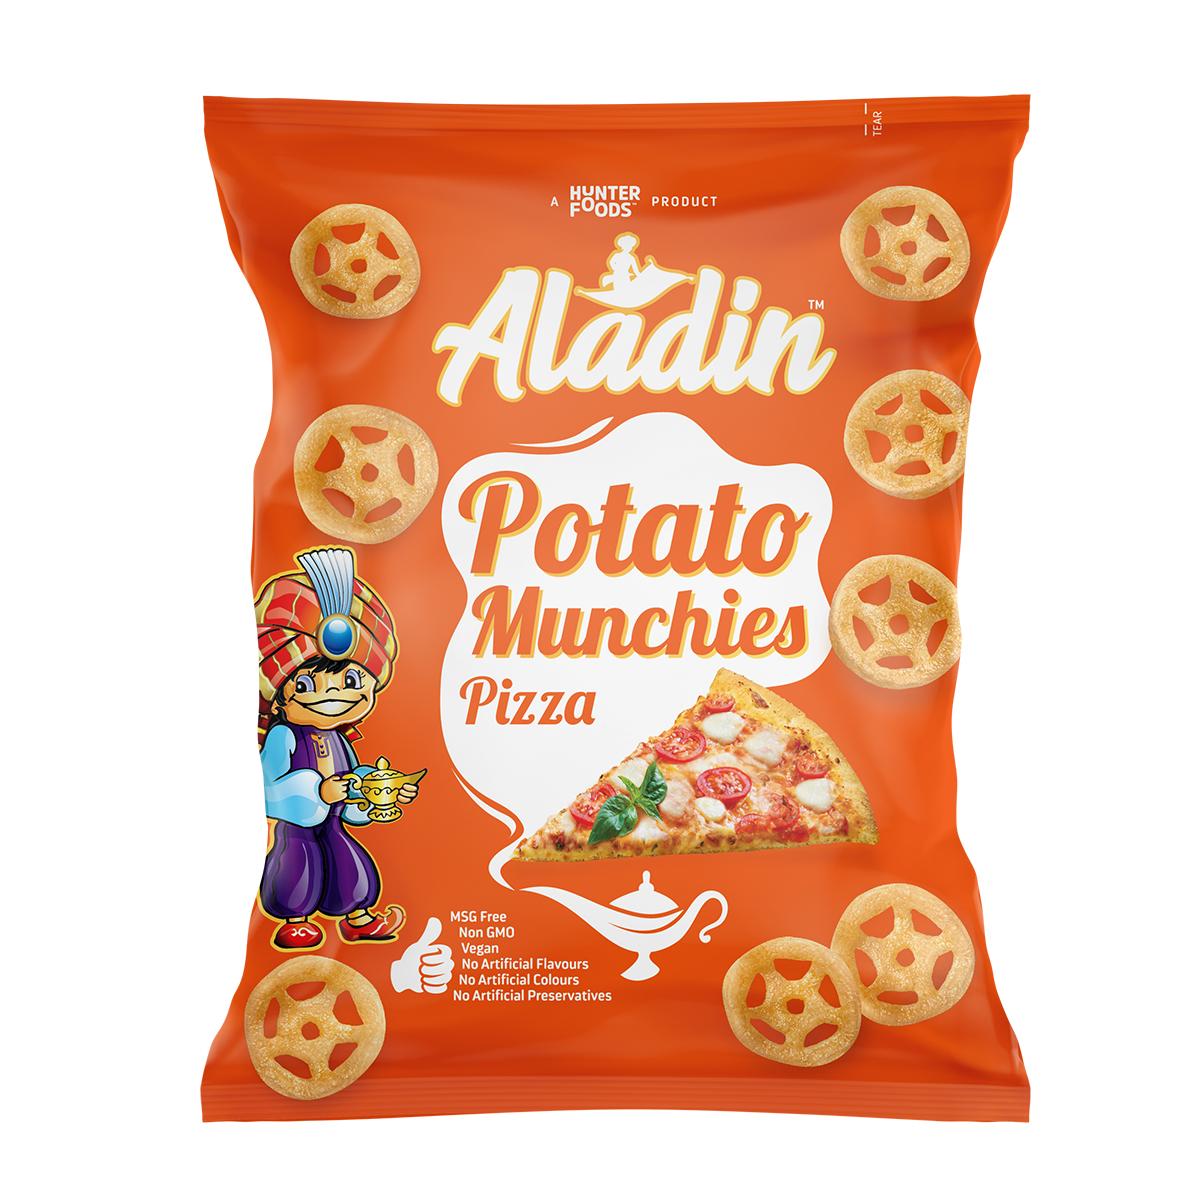 Alibaba Potato Crunchies – Chilli Cheese (15gm)